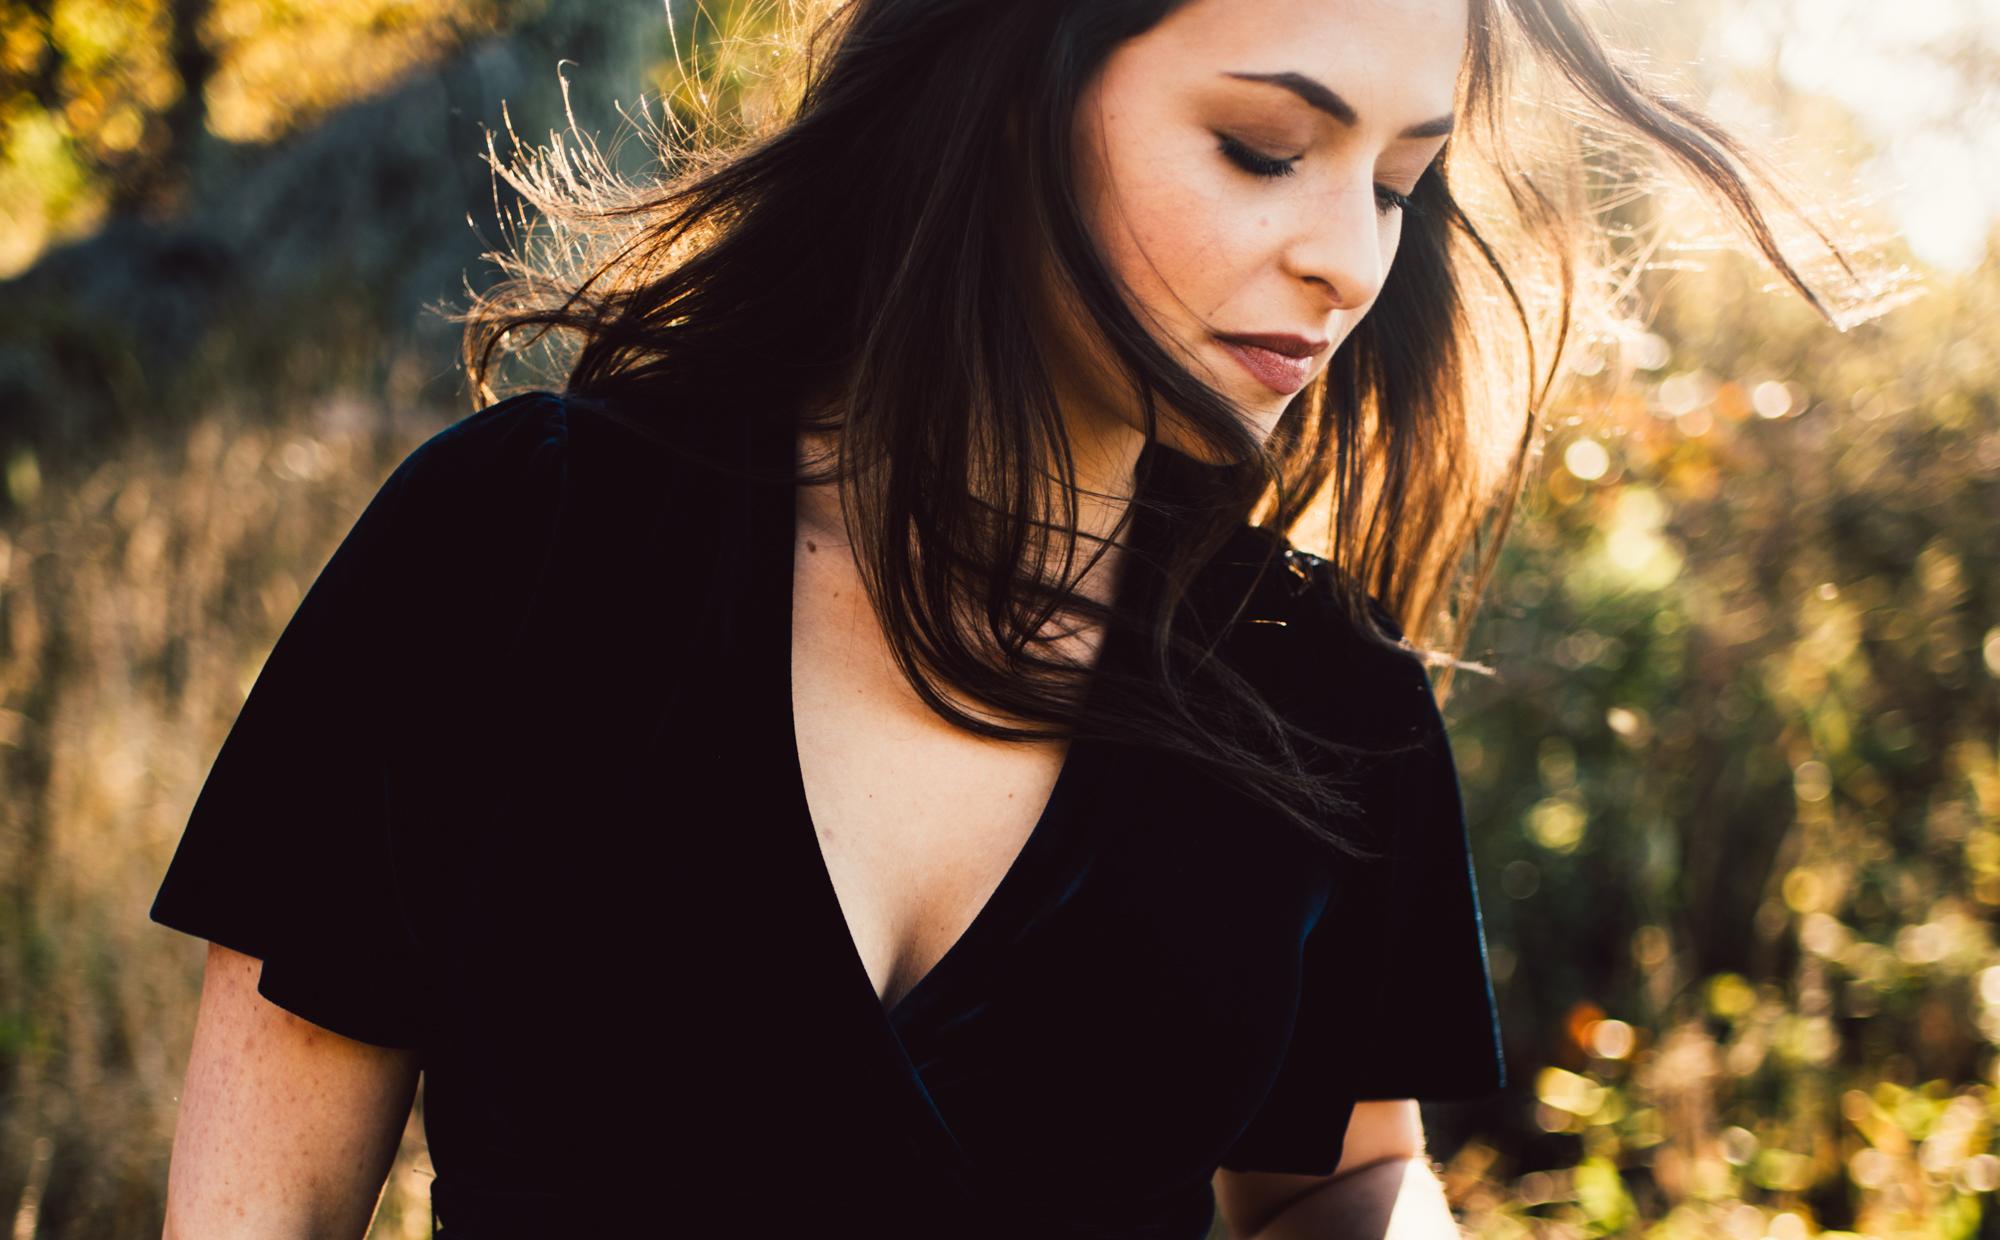 Megan_Shenandoah_National_Park_Windy_Romantic_Portraits_39.JPG